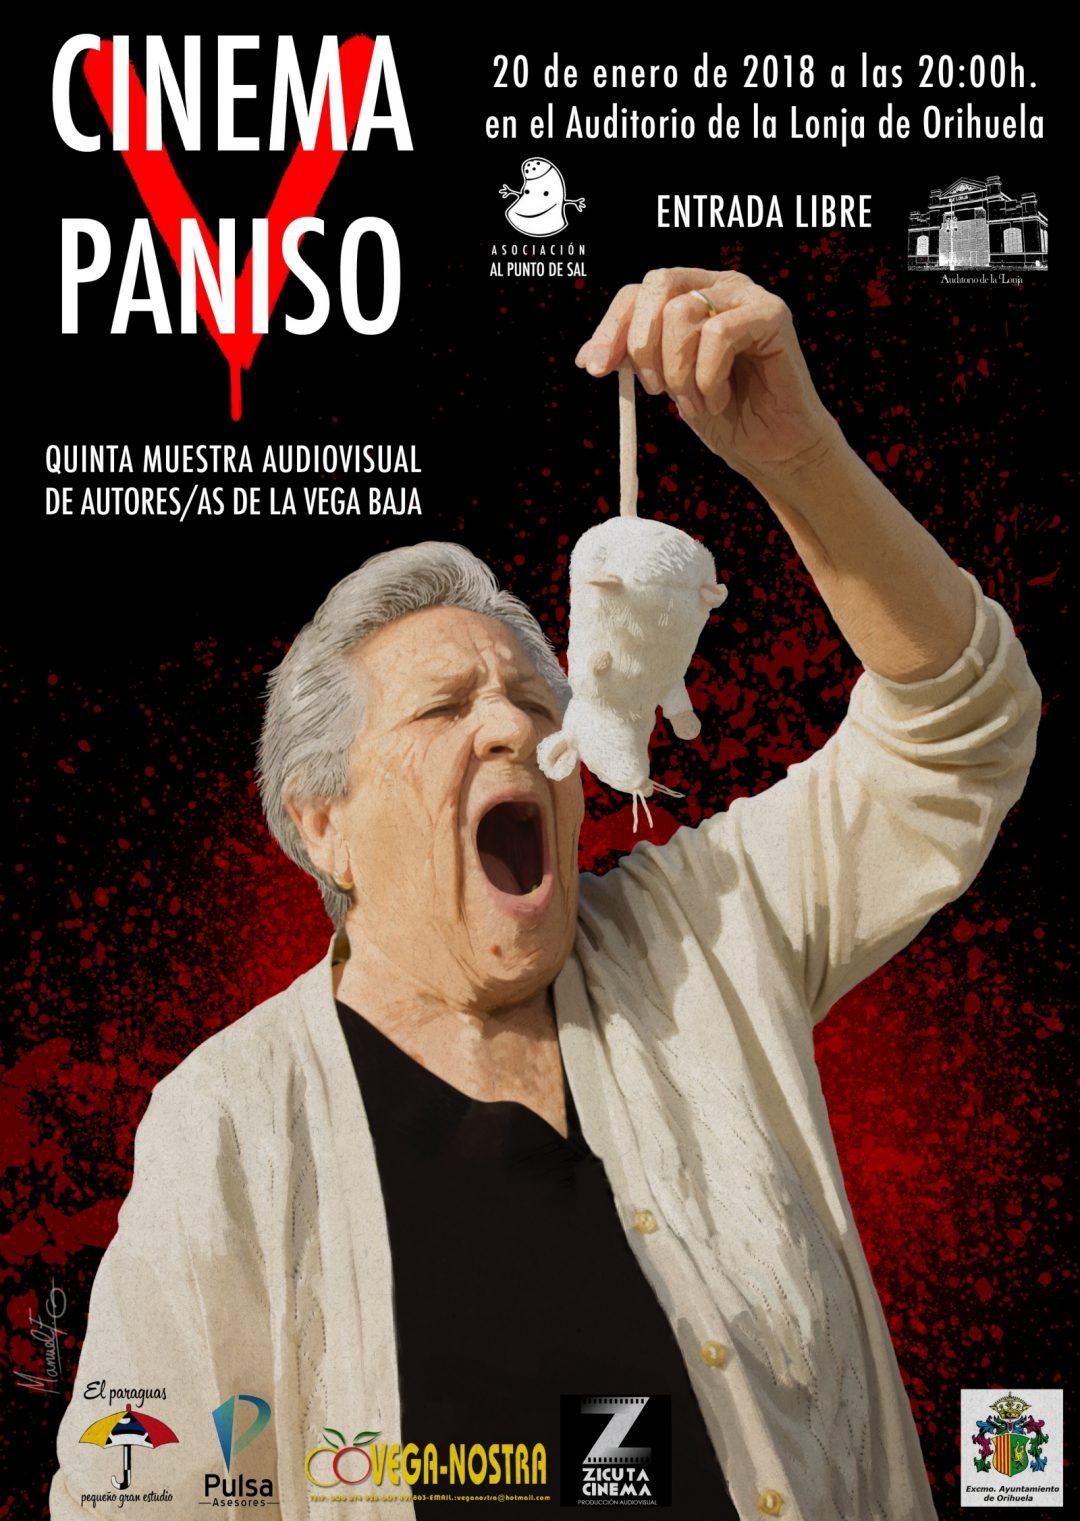 Cinema Paniso 2018